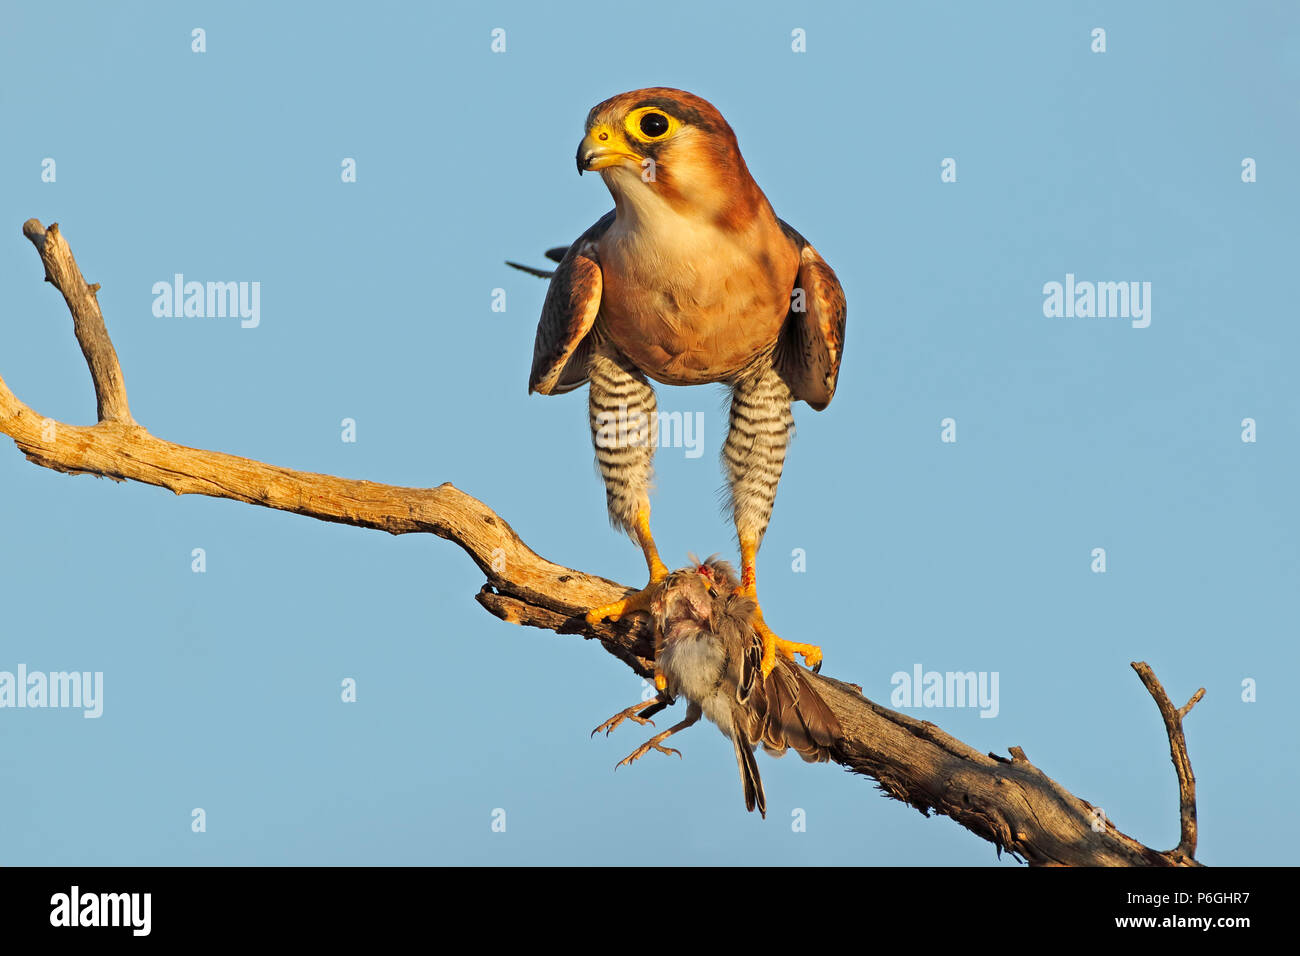 A red-necked falcon (Falco chiquera) with bird prey, South Africa Stock Photo